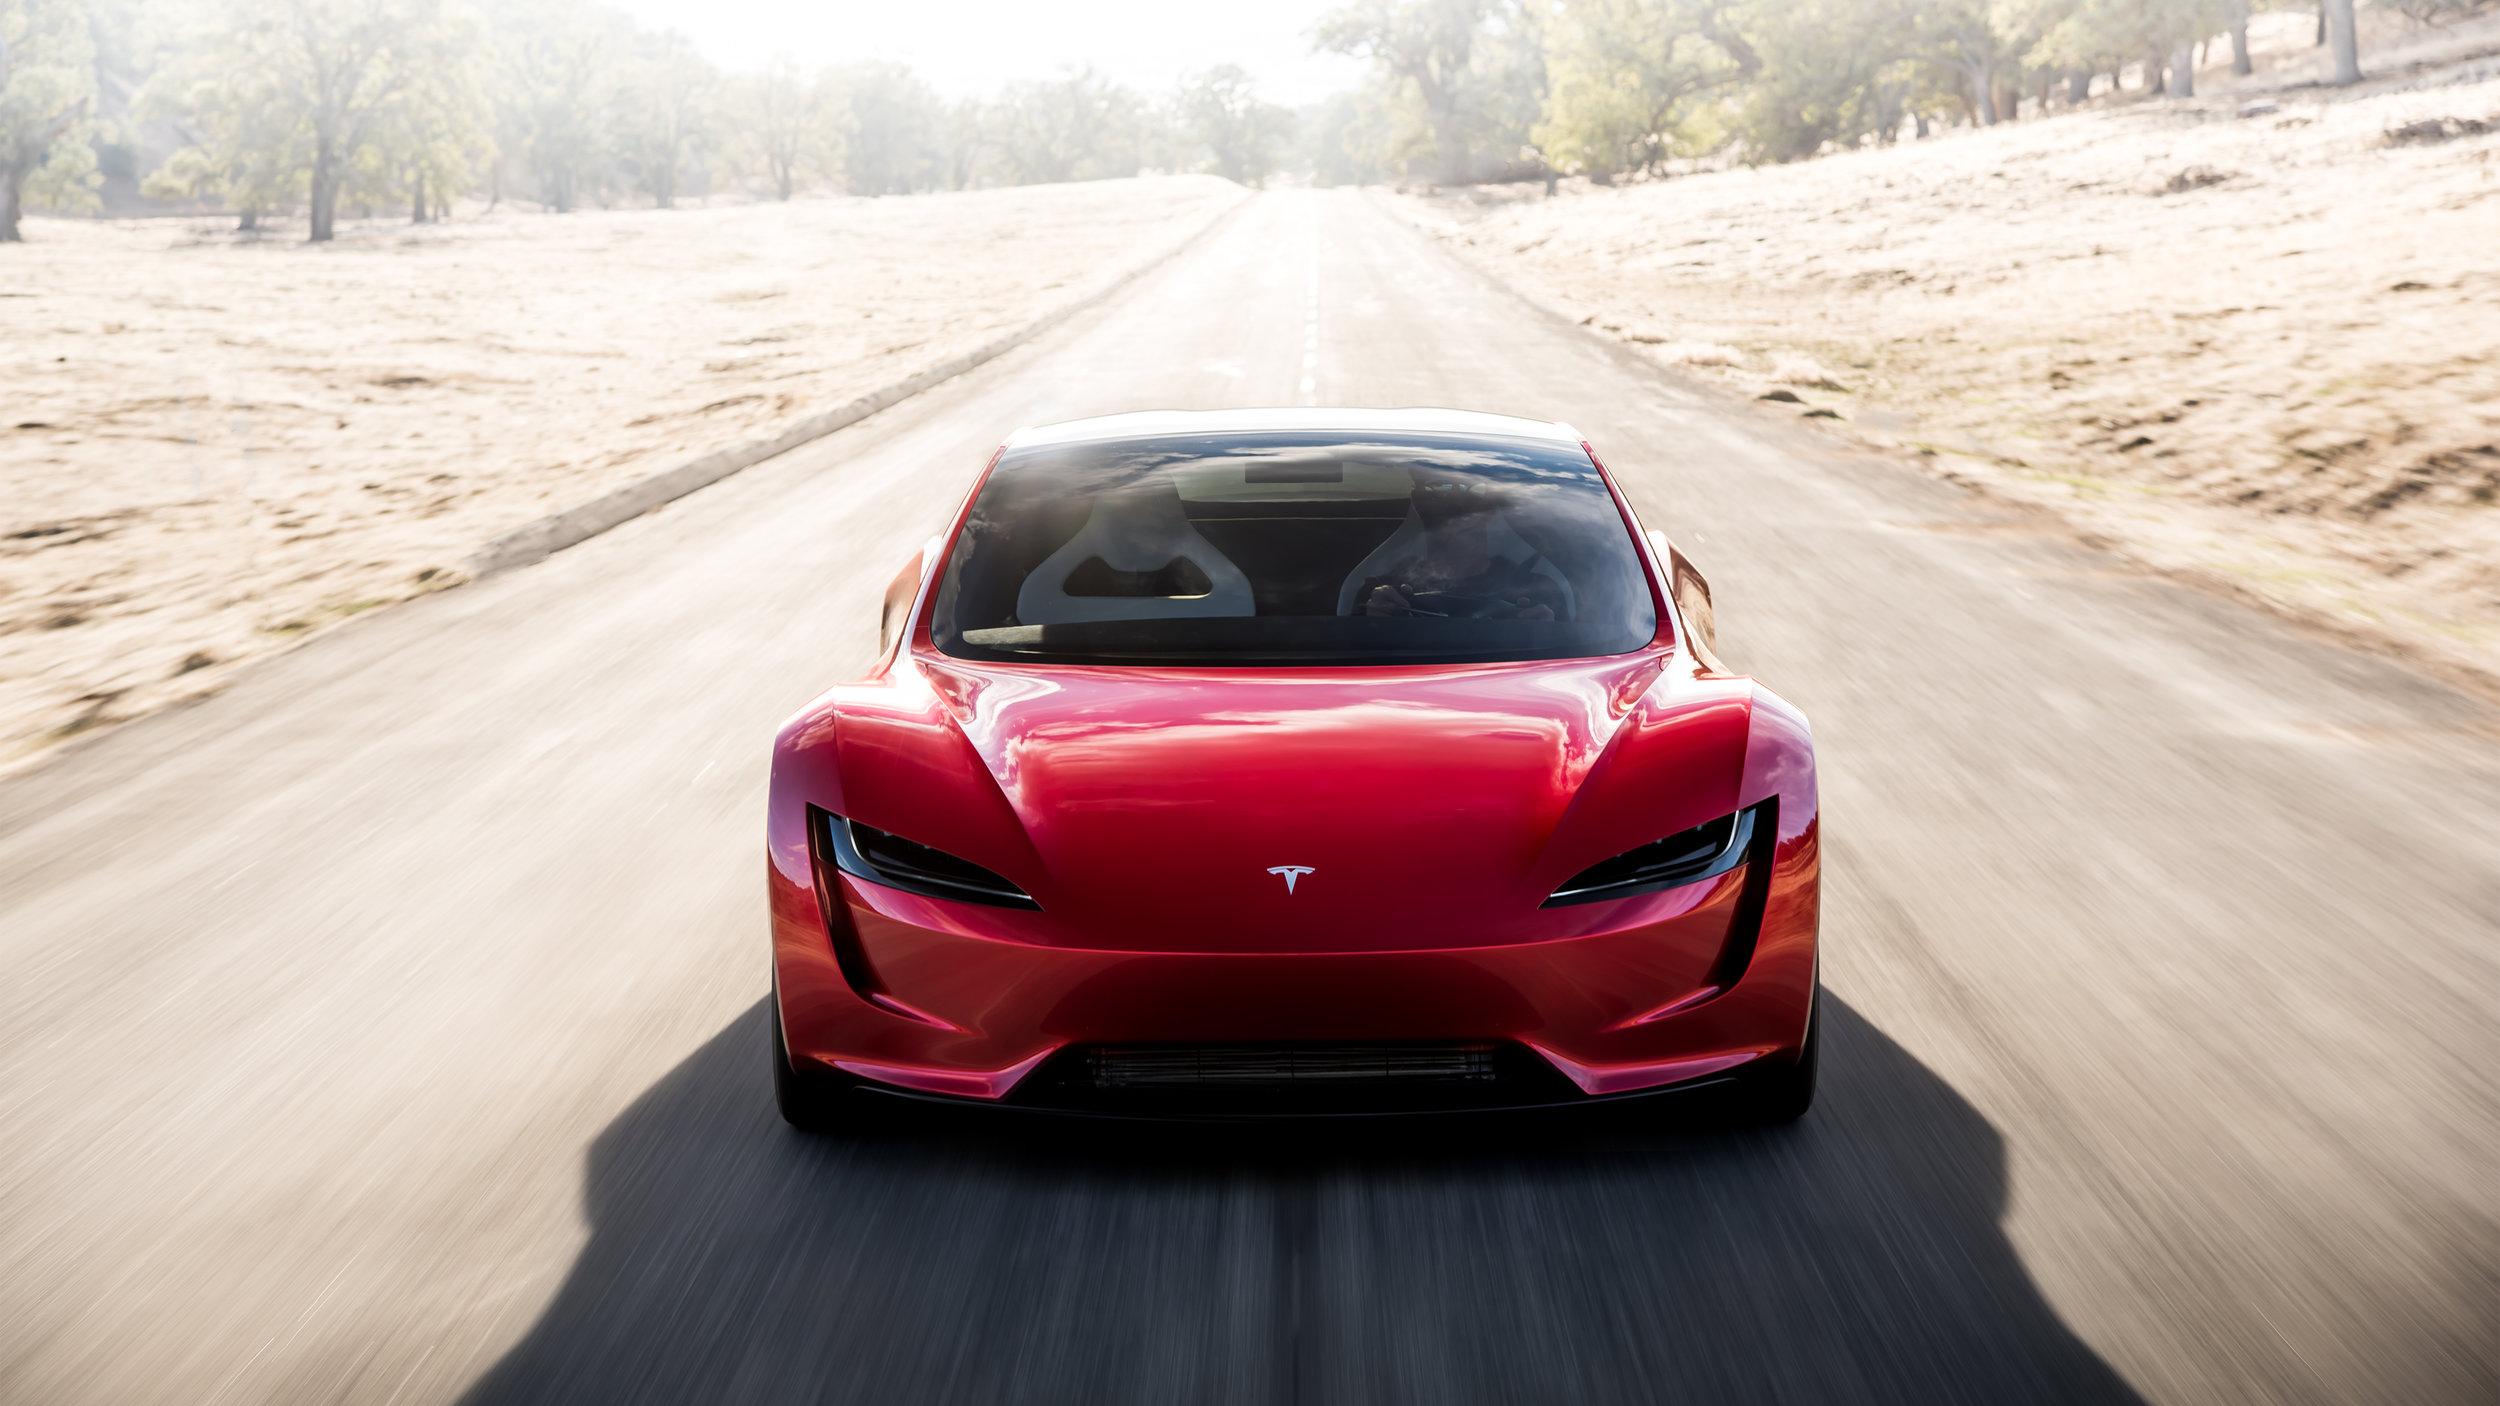 Roadster_Front_Profile.jpg